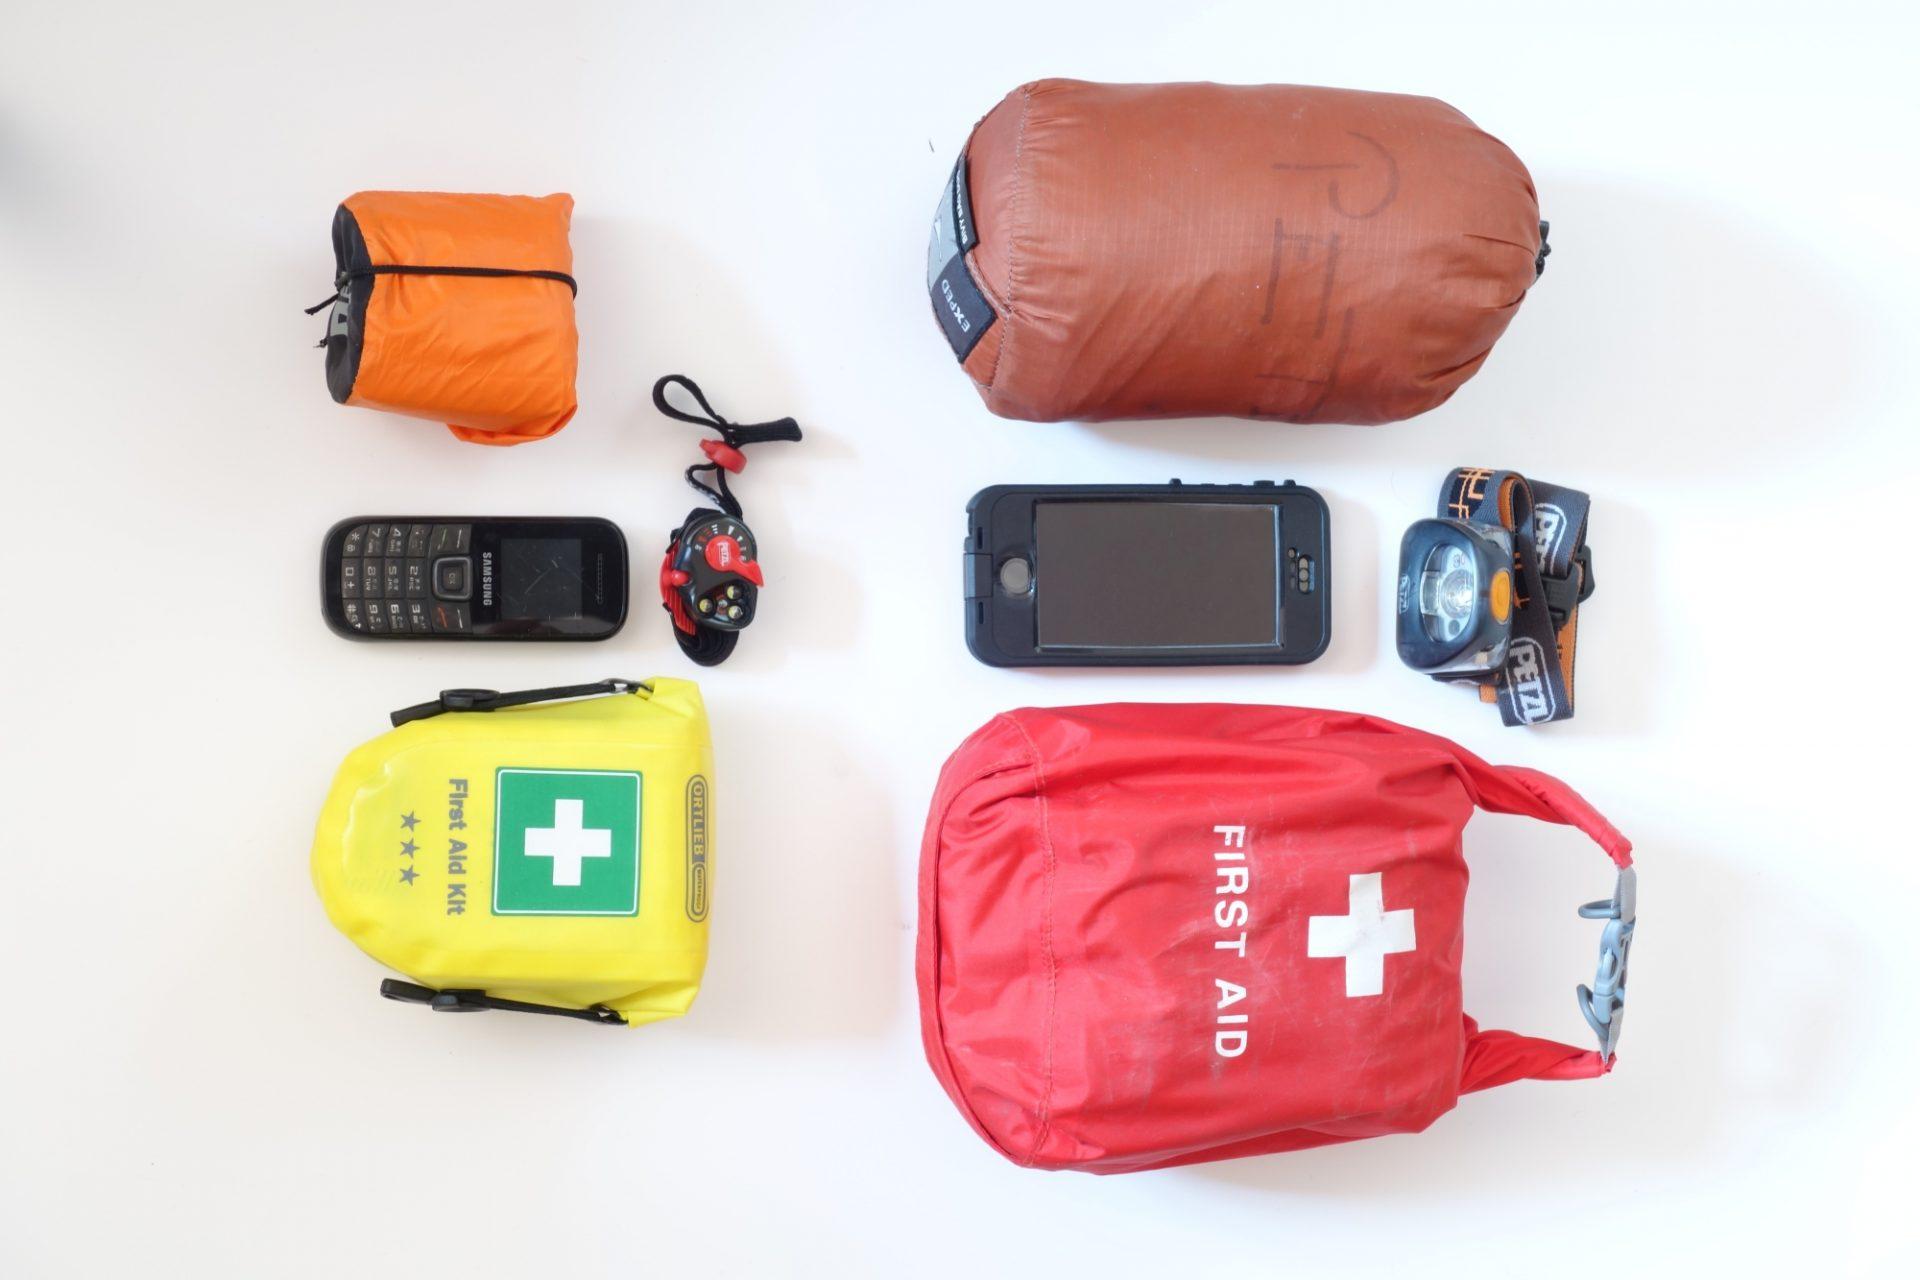 Notfallausrüstung © Peter Plattner